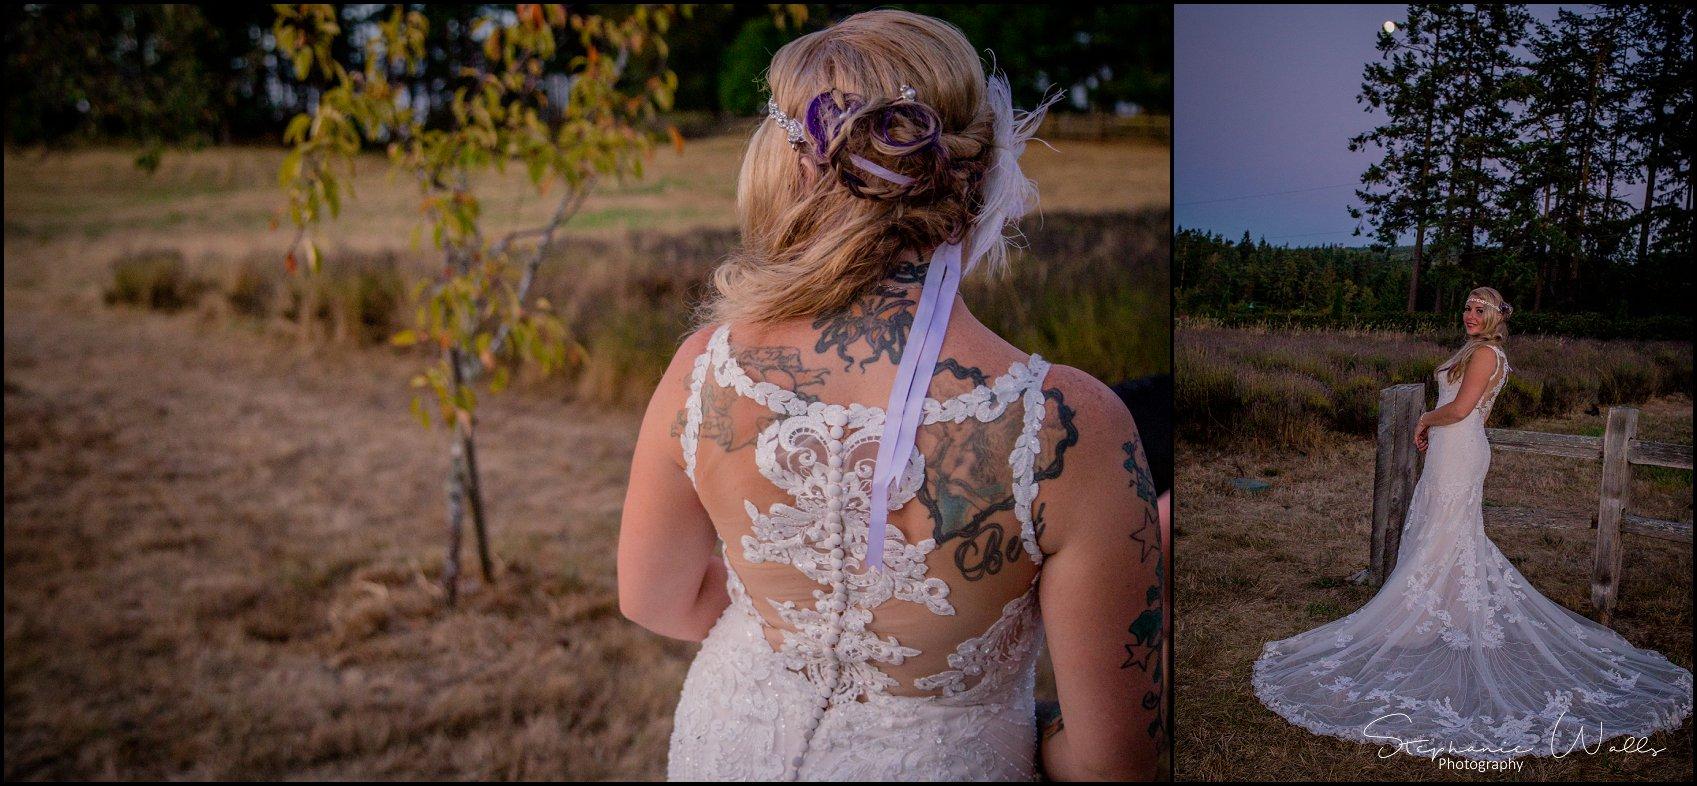 Everist Wedding 103 Patti & Bobbys | Troll Haven Castle & Bandy Farms | Sequim, Wa Wedding Photographer